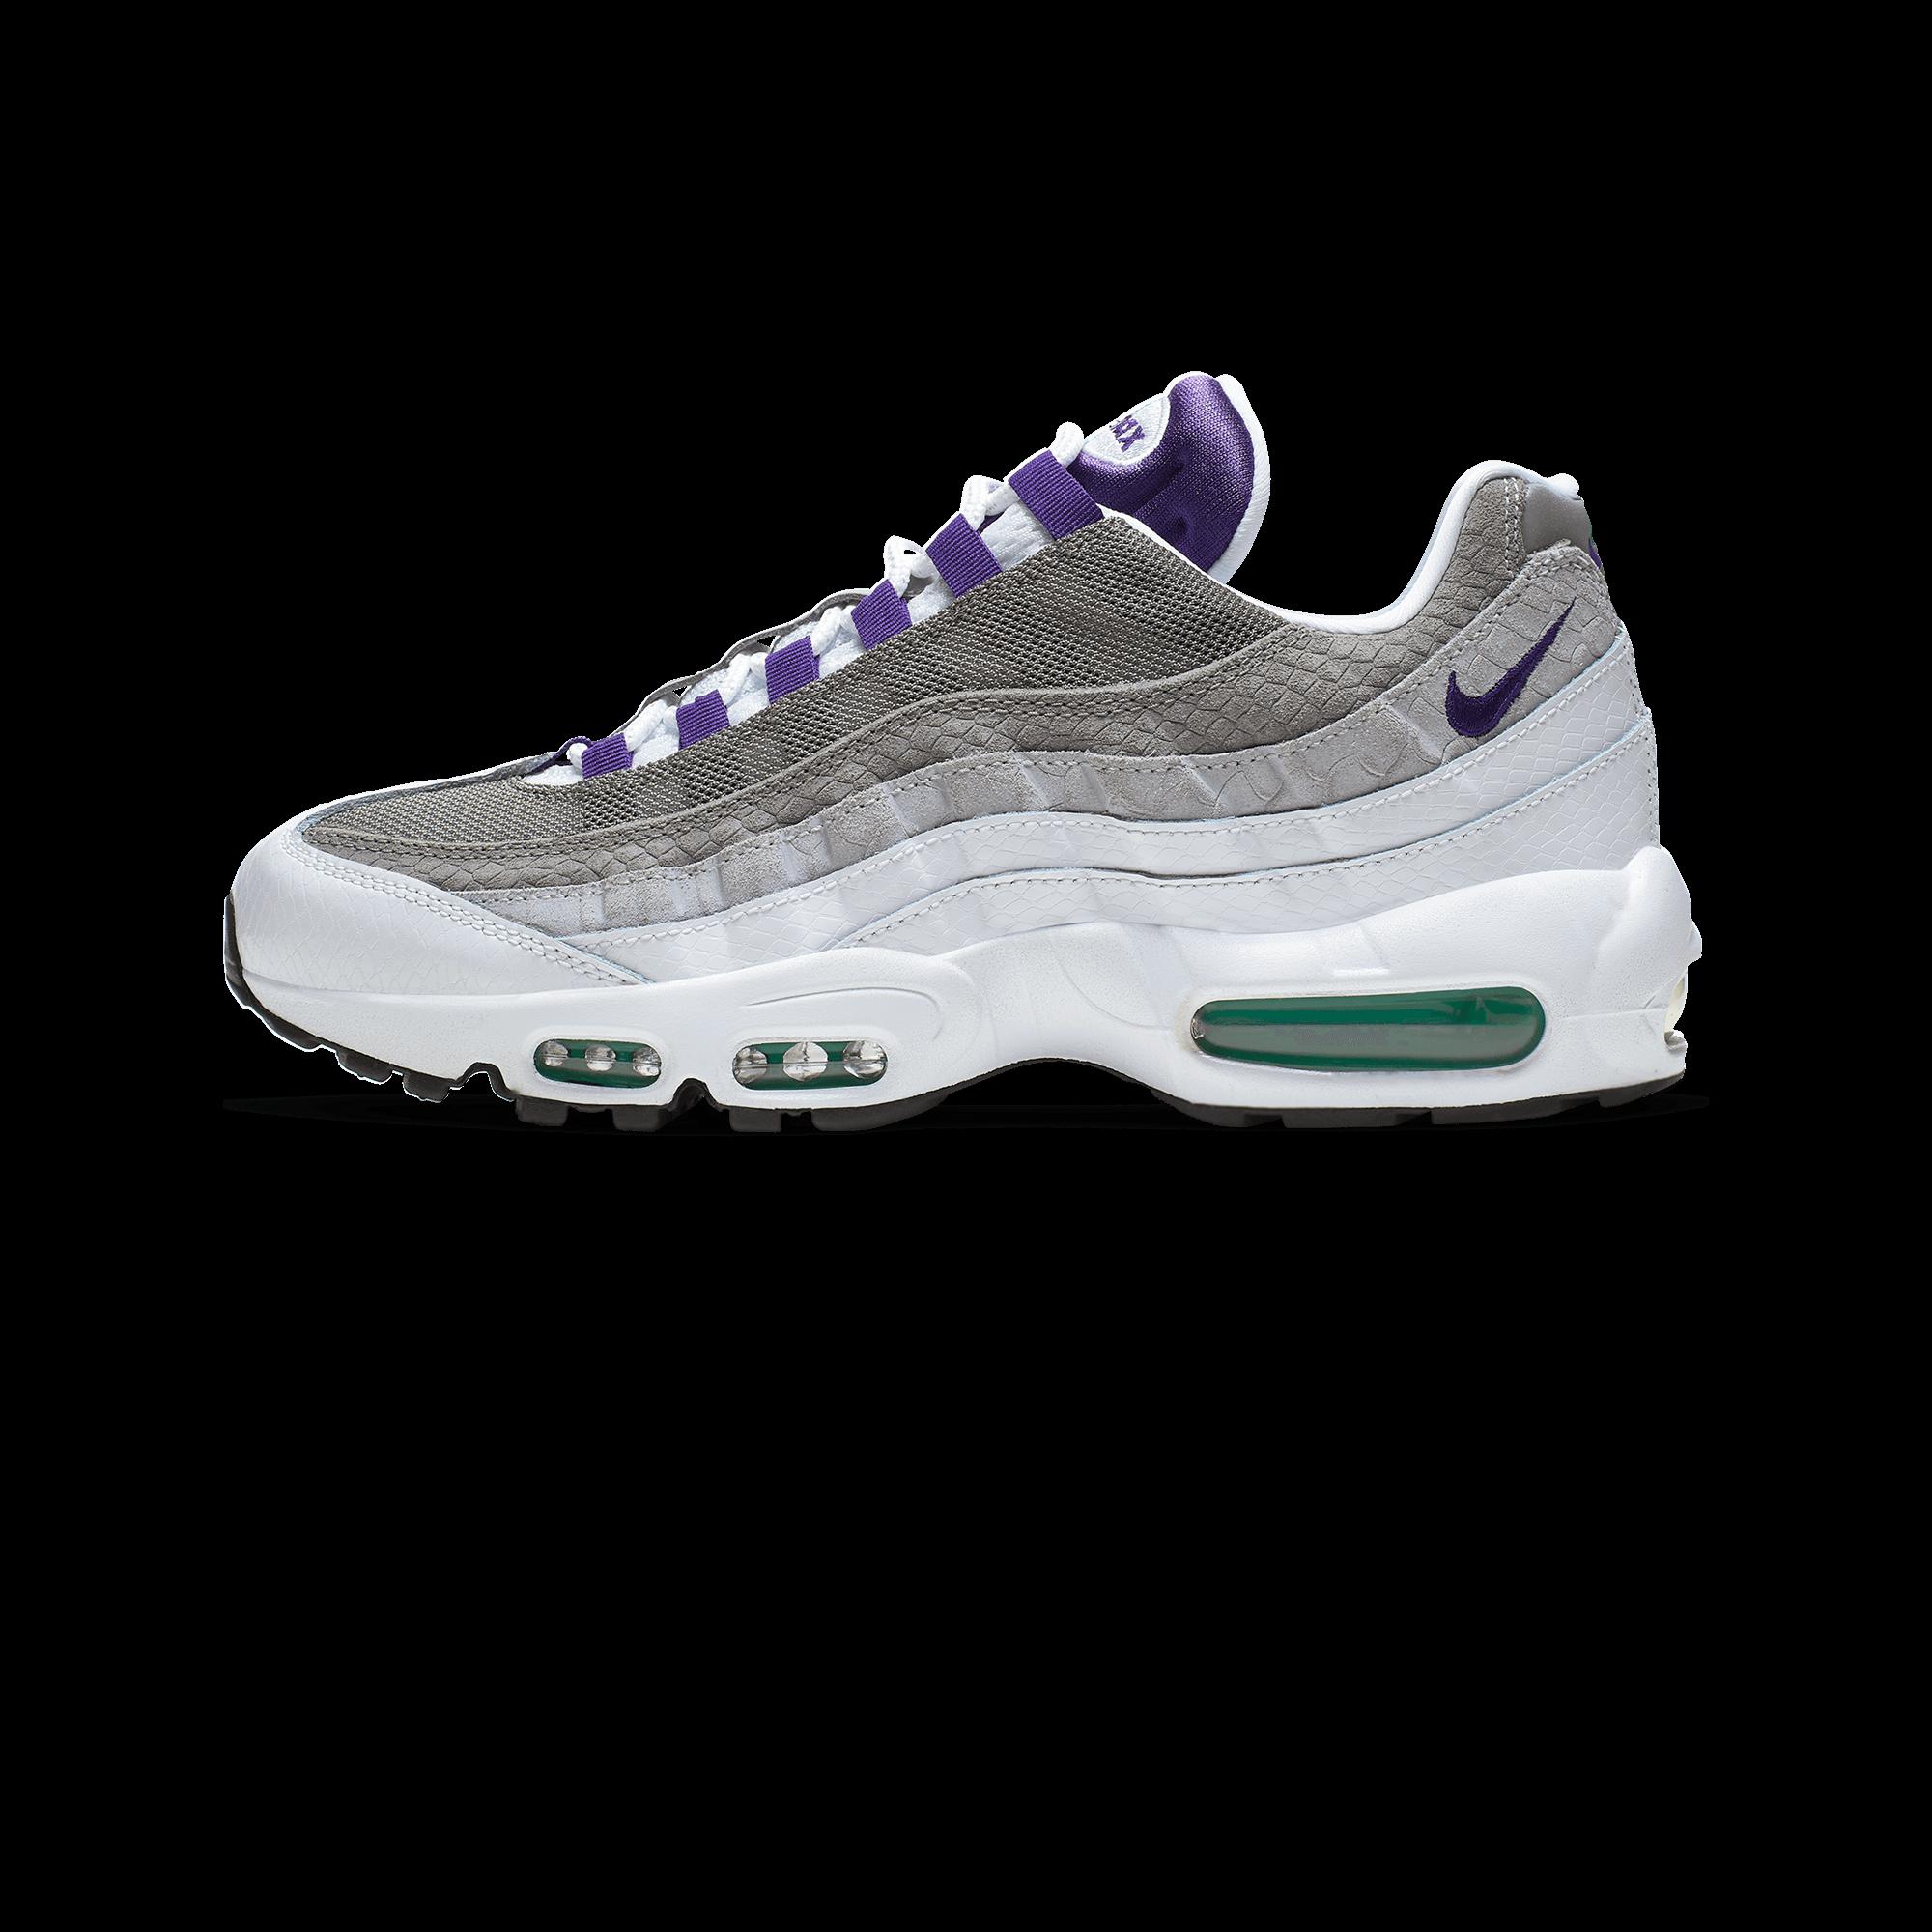 uk availability 4b0be ac412 Nike Air Max 95 LV8 white / court purple / emerald green - Men |  Holypopstore.com